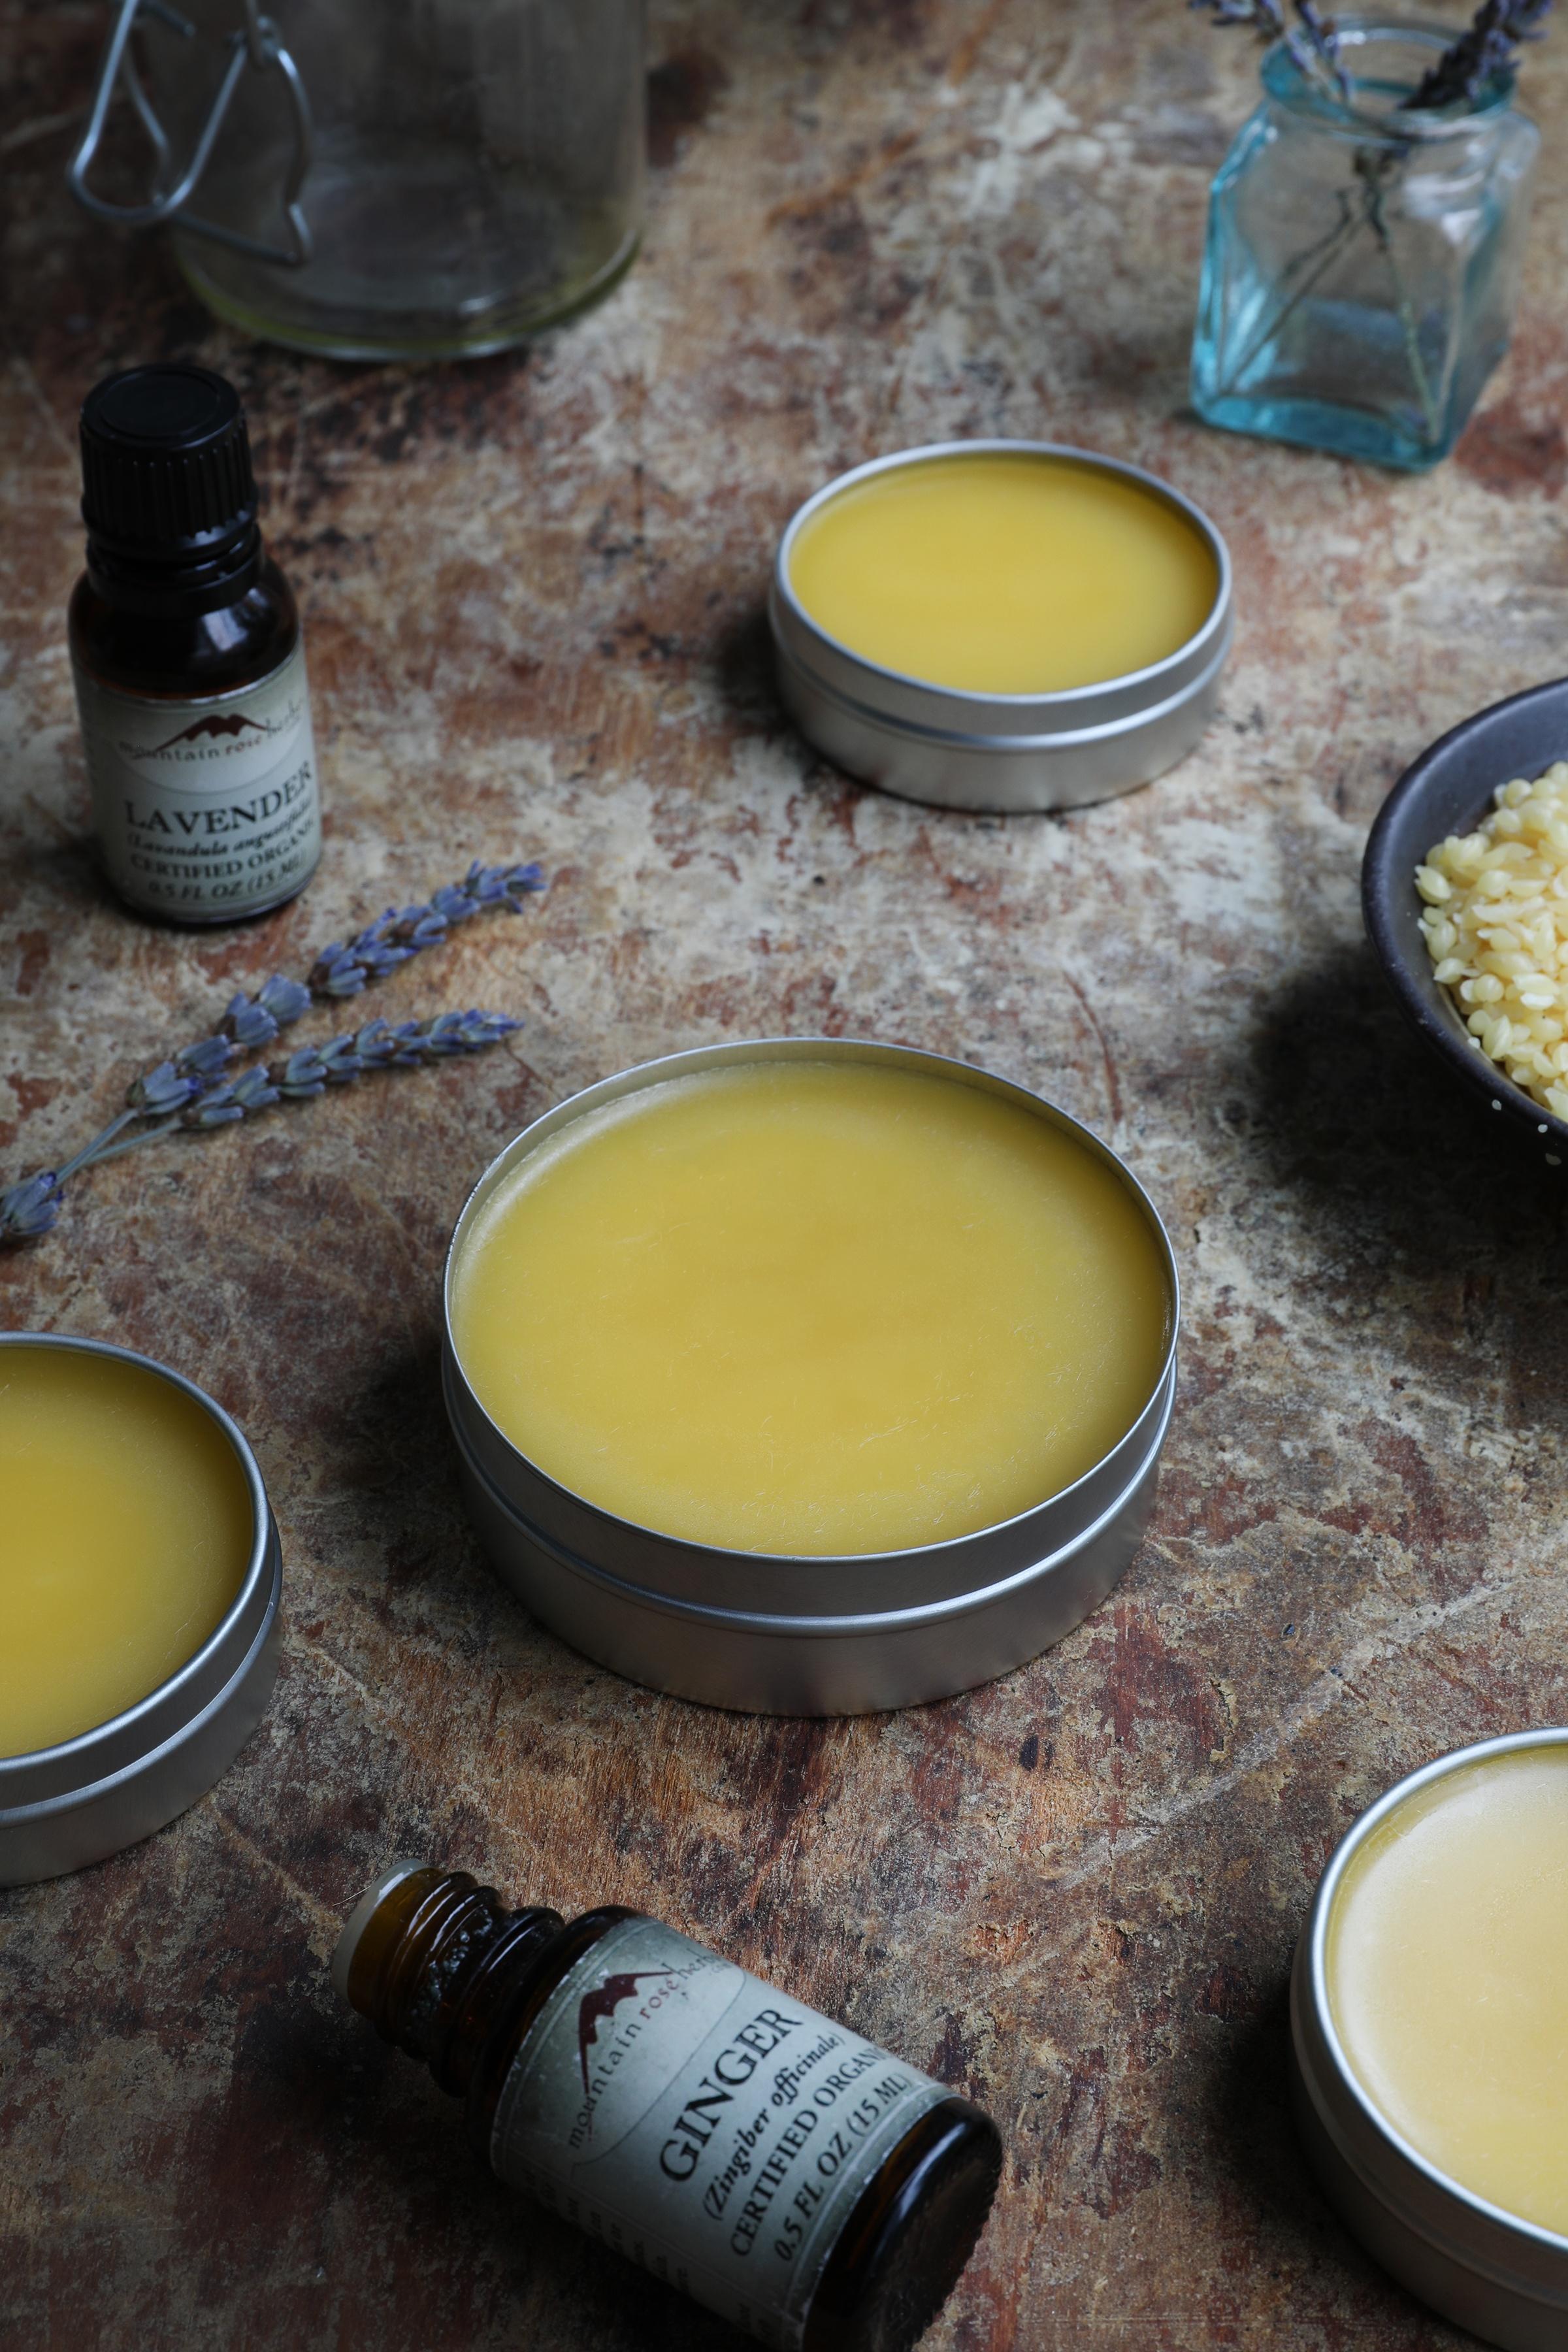 Tin jars filled with hardened arnica lavender salve